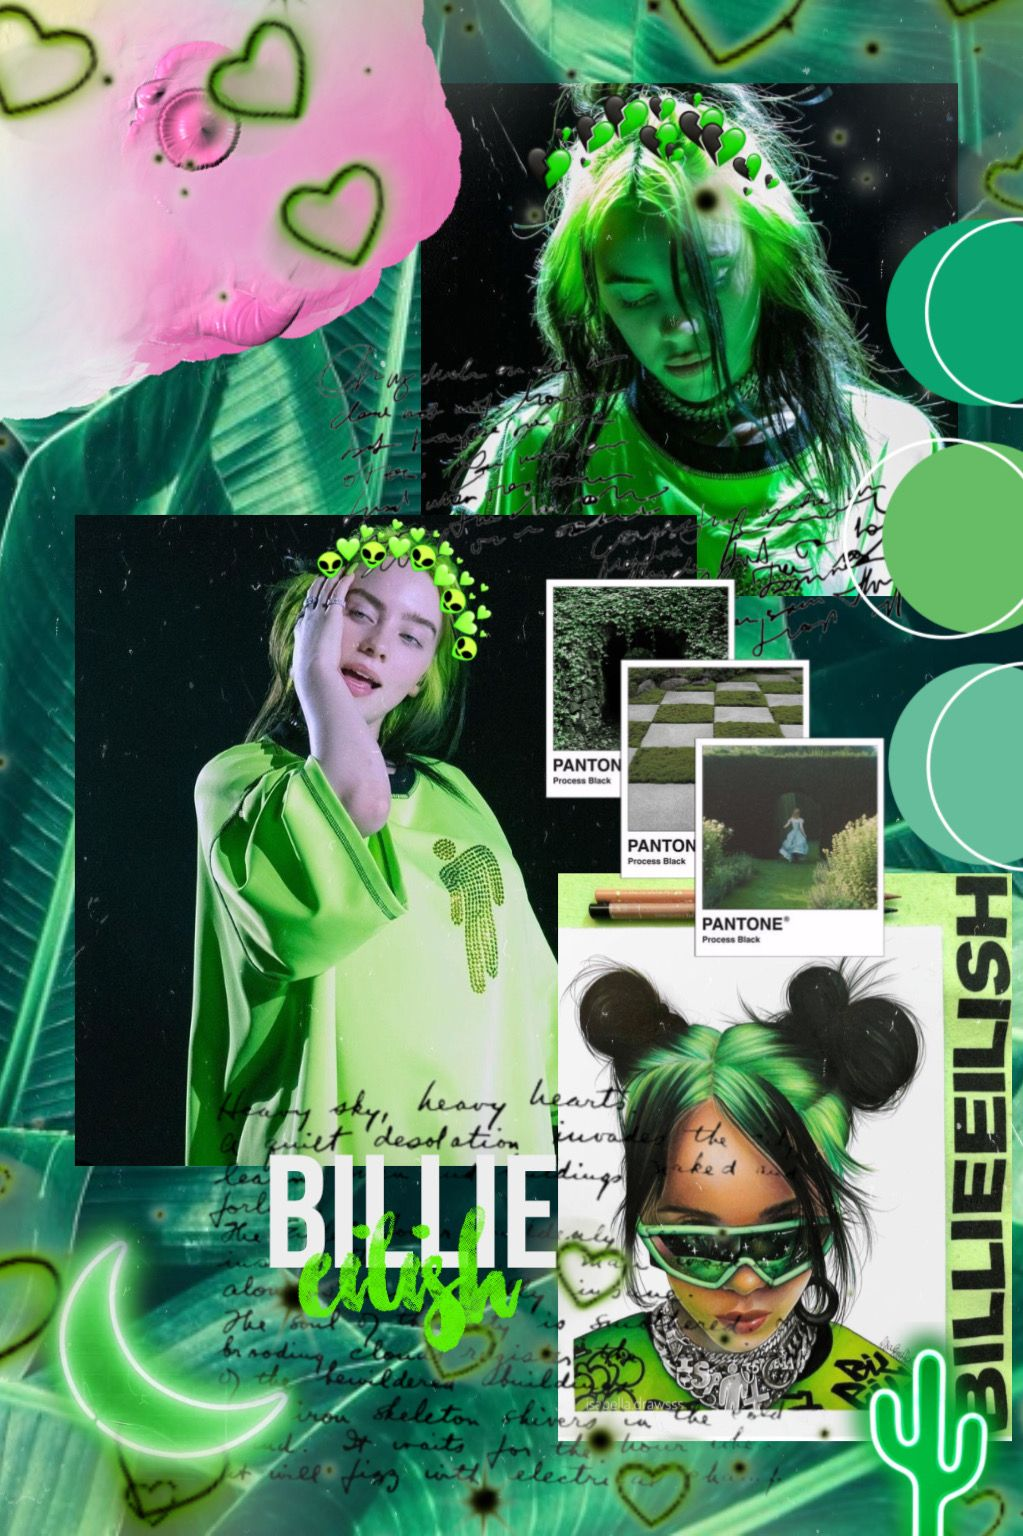 Billie Eilish Aesthetic Green Green Aesthetic Cute Emoji Wallpaper Billie